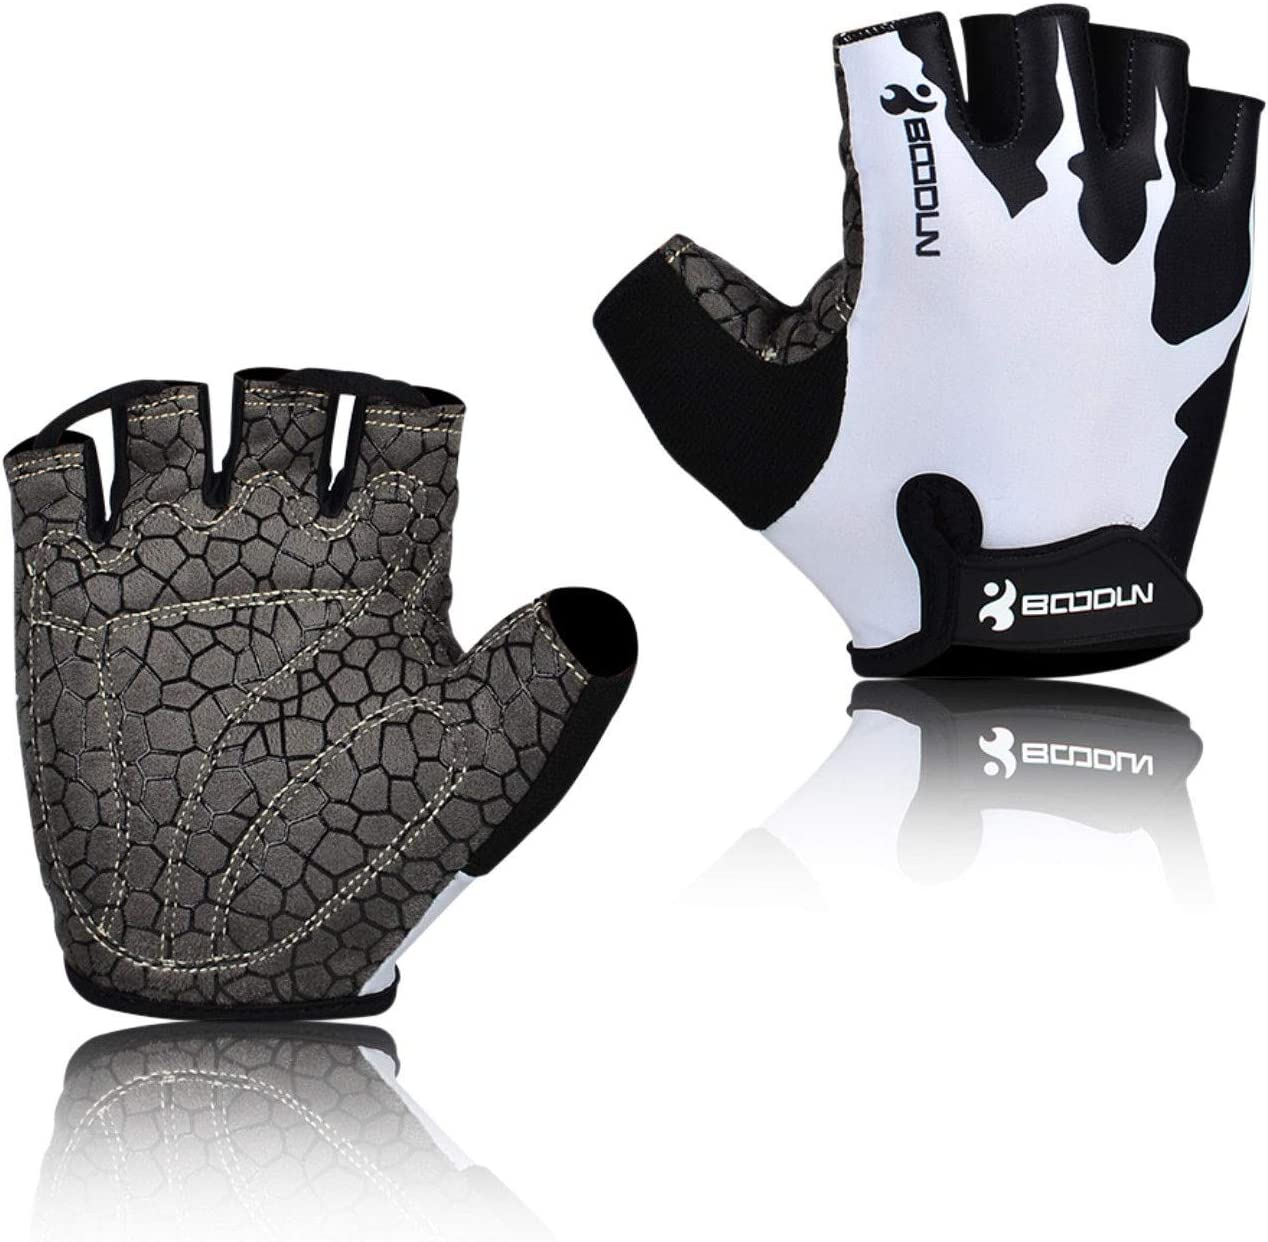 Safe Sport Cycling Gloves Half Finger Bicycle Gel Pad MTB Road Bike Racing Glove